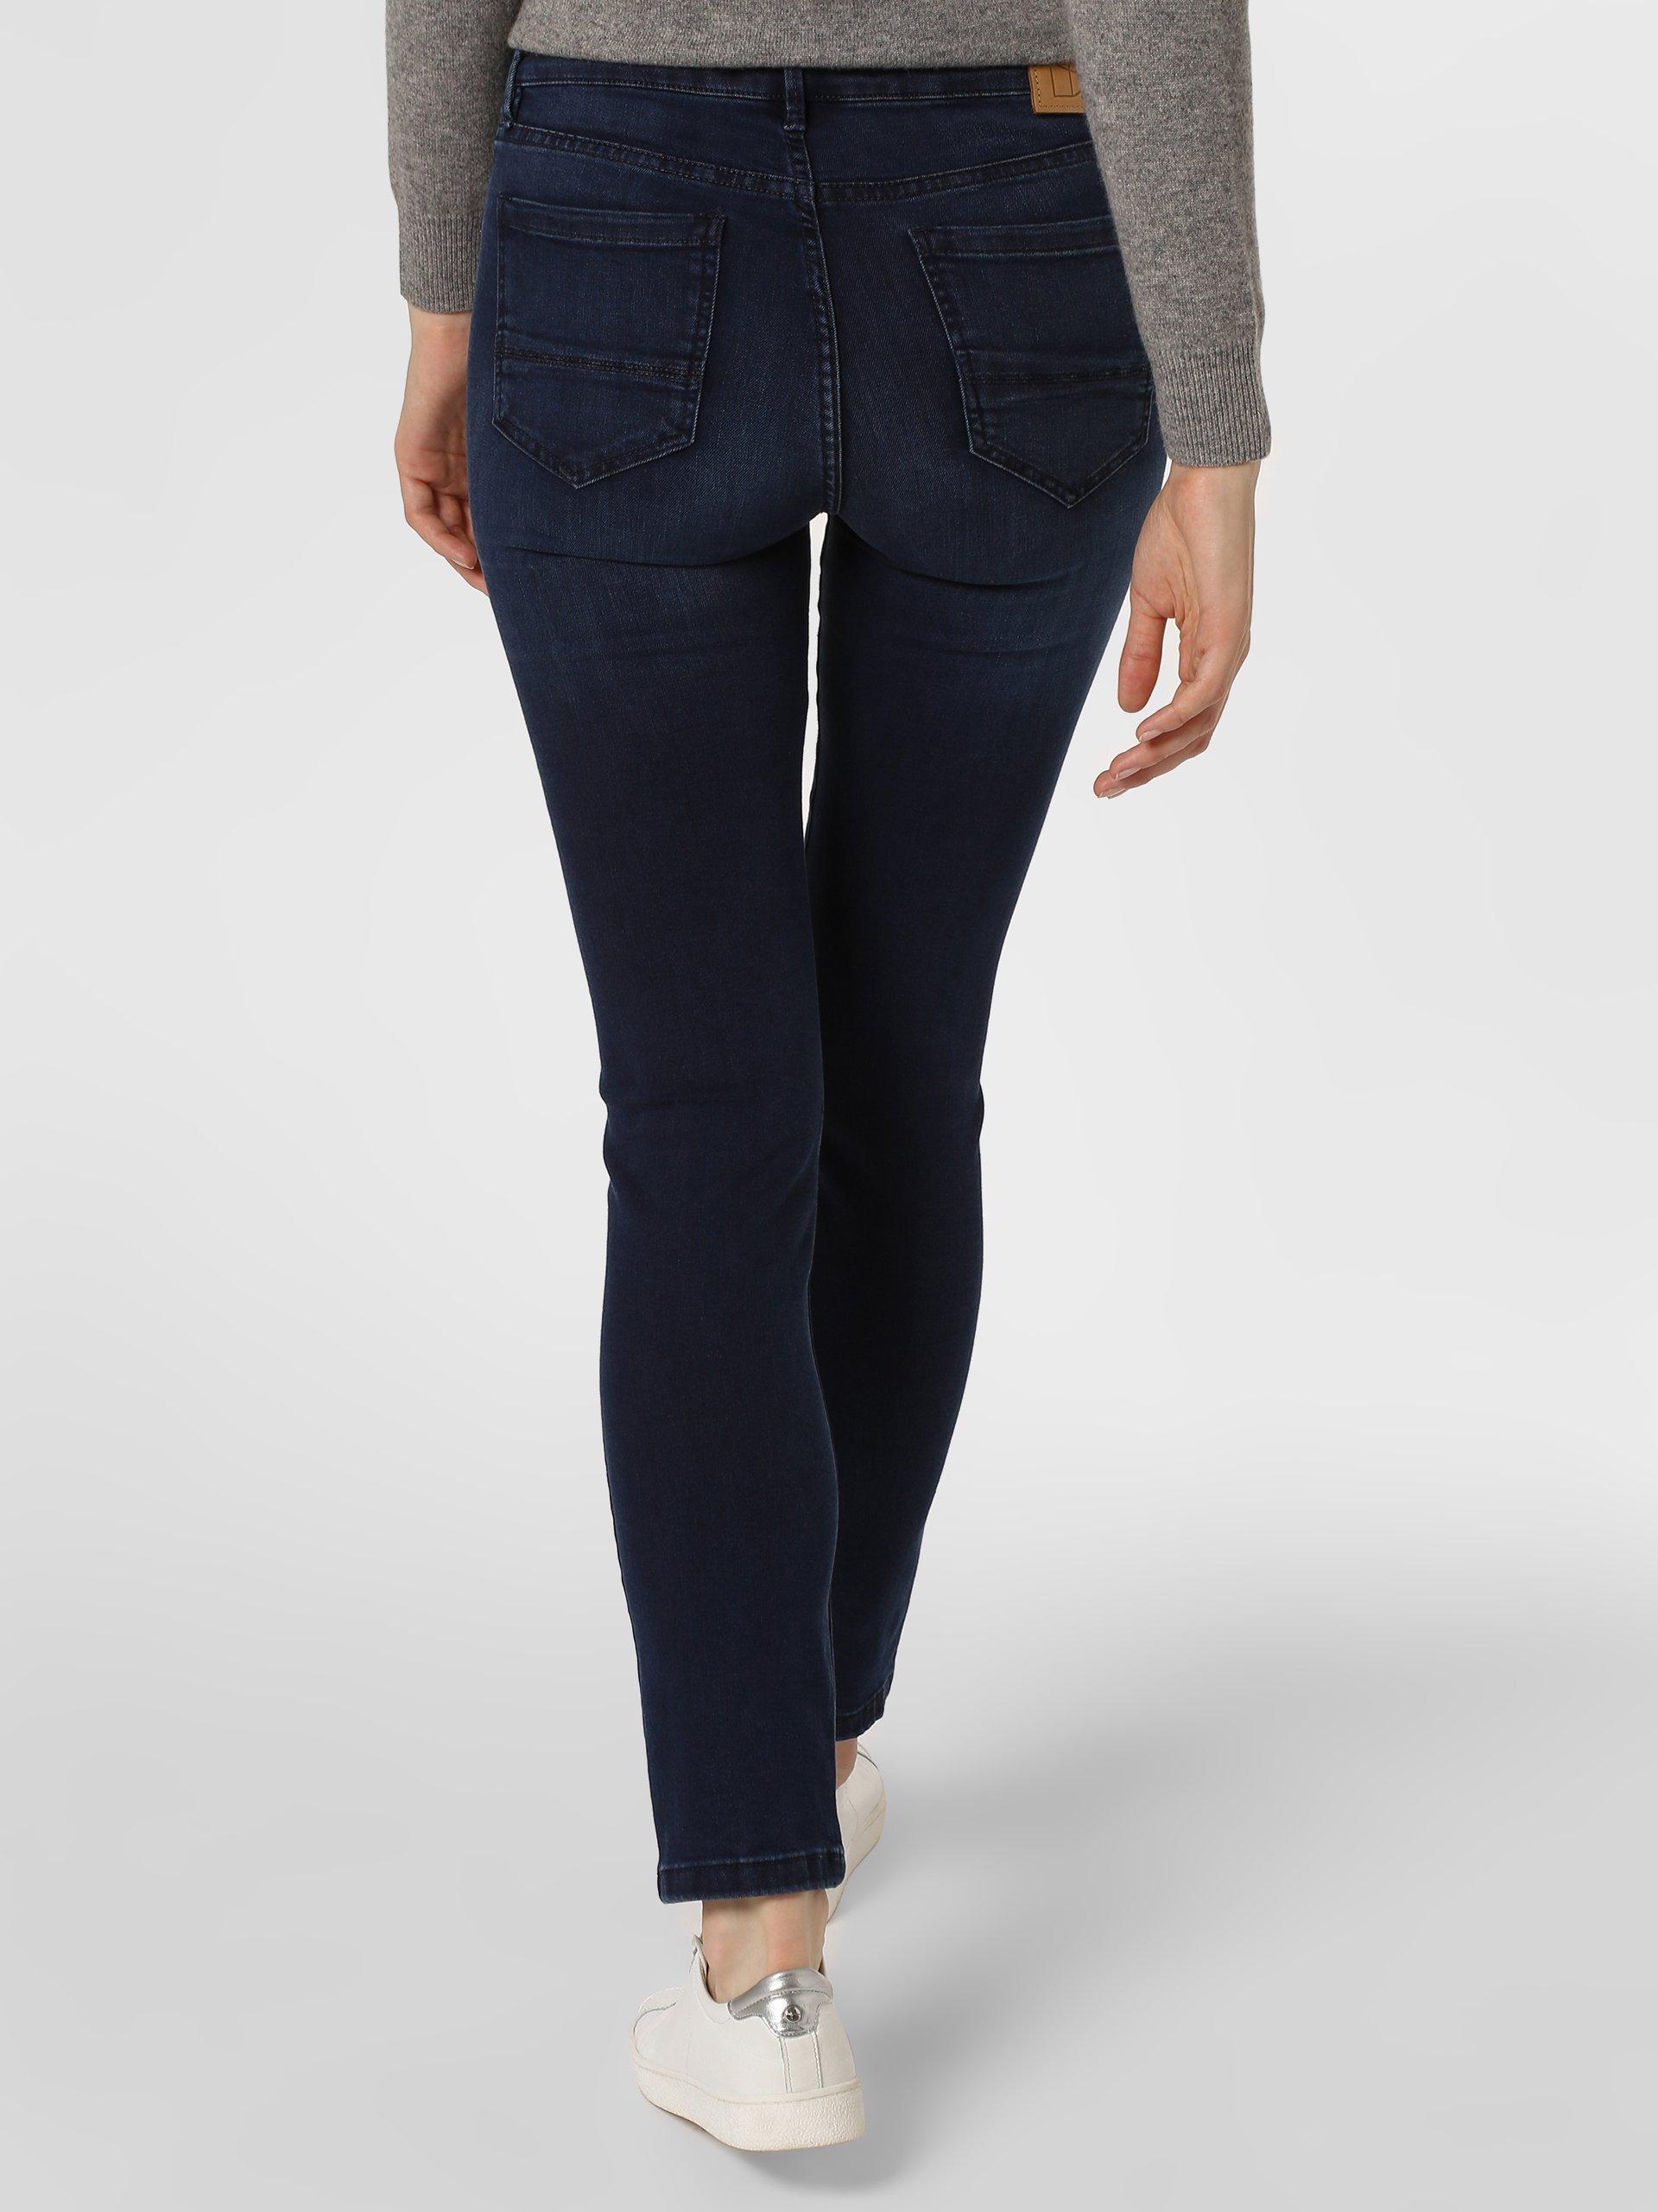 Someday Damen Jeans - Cadou